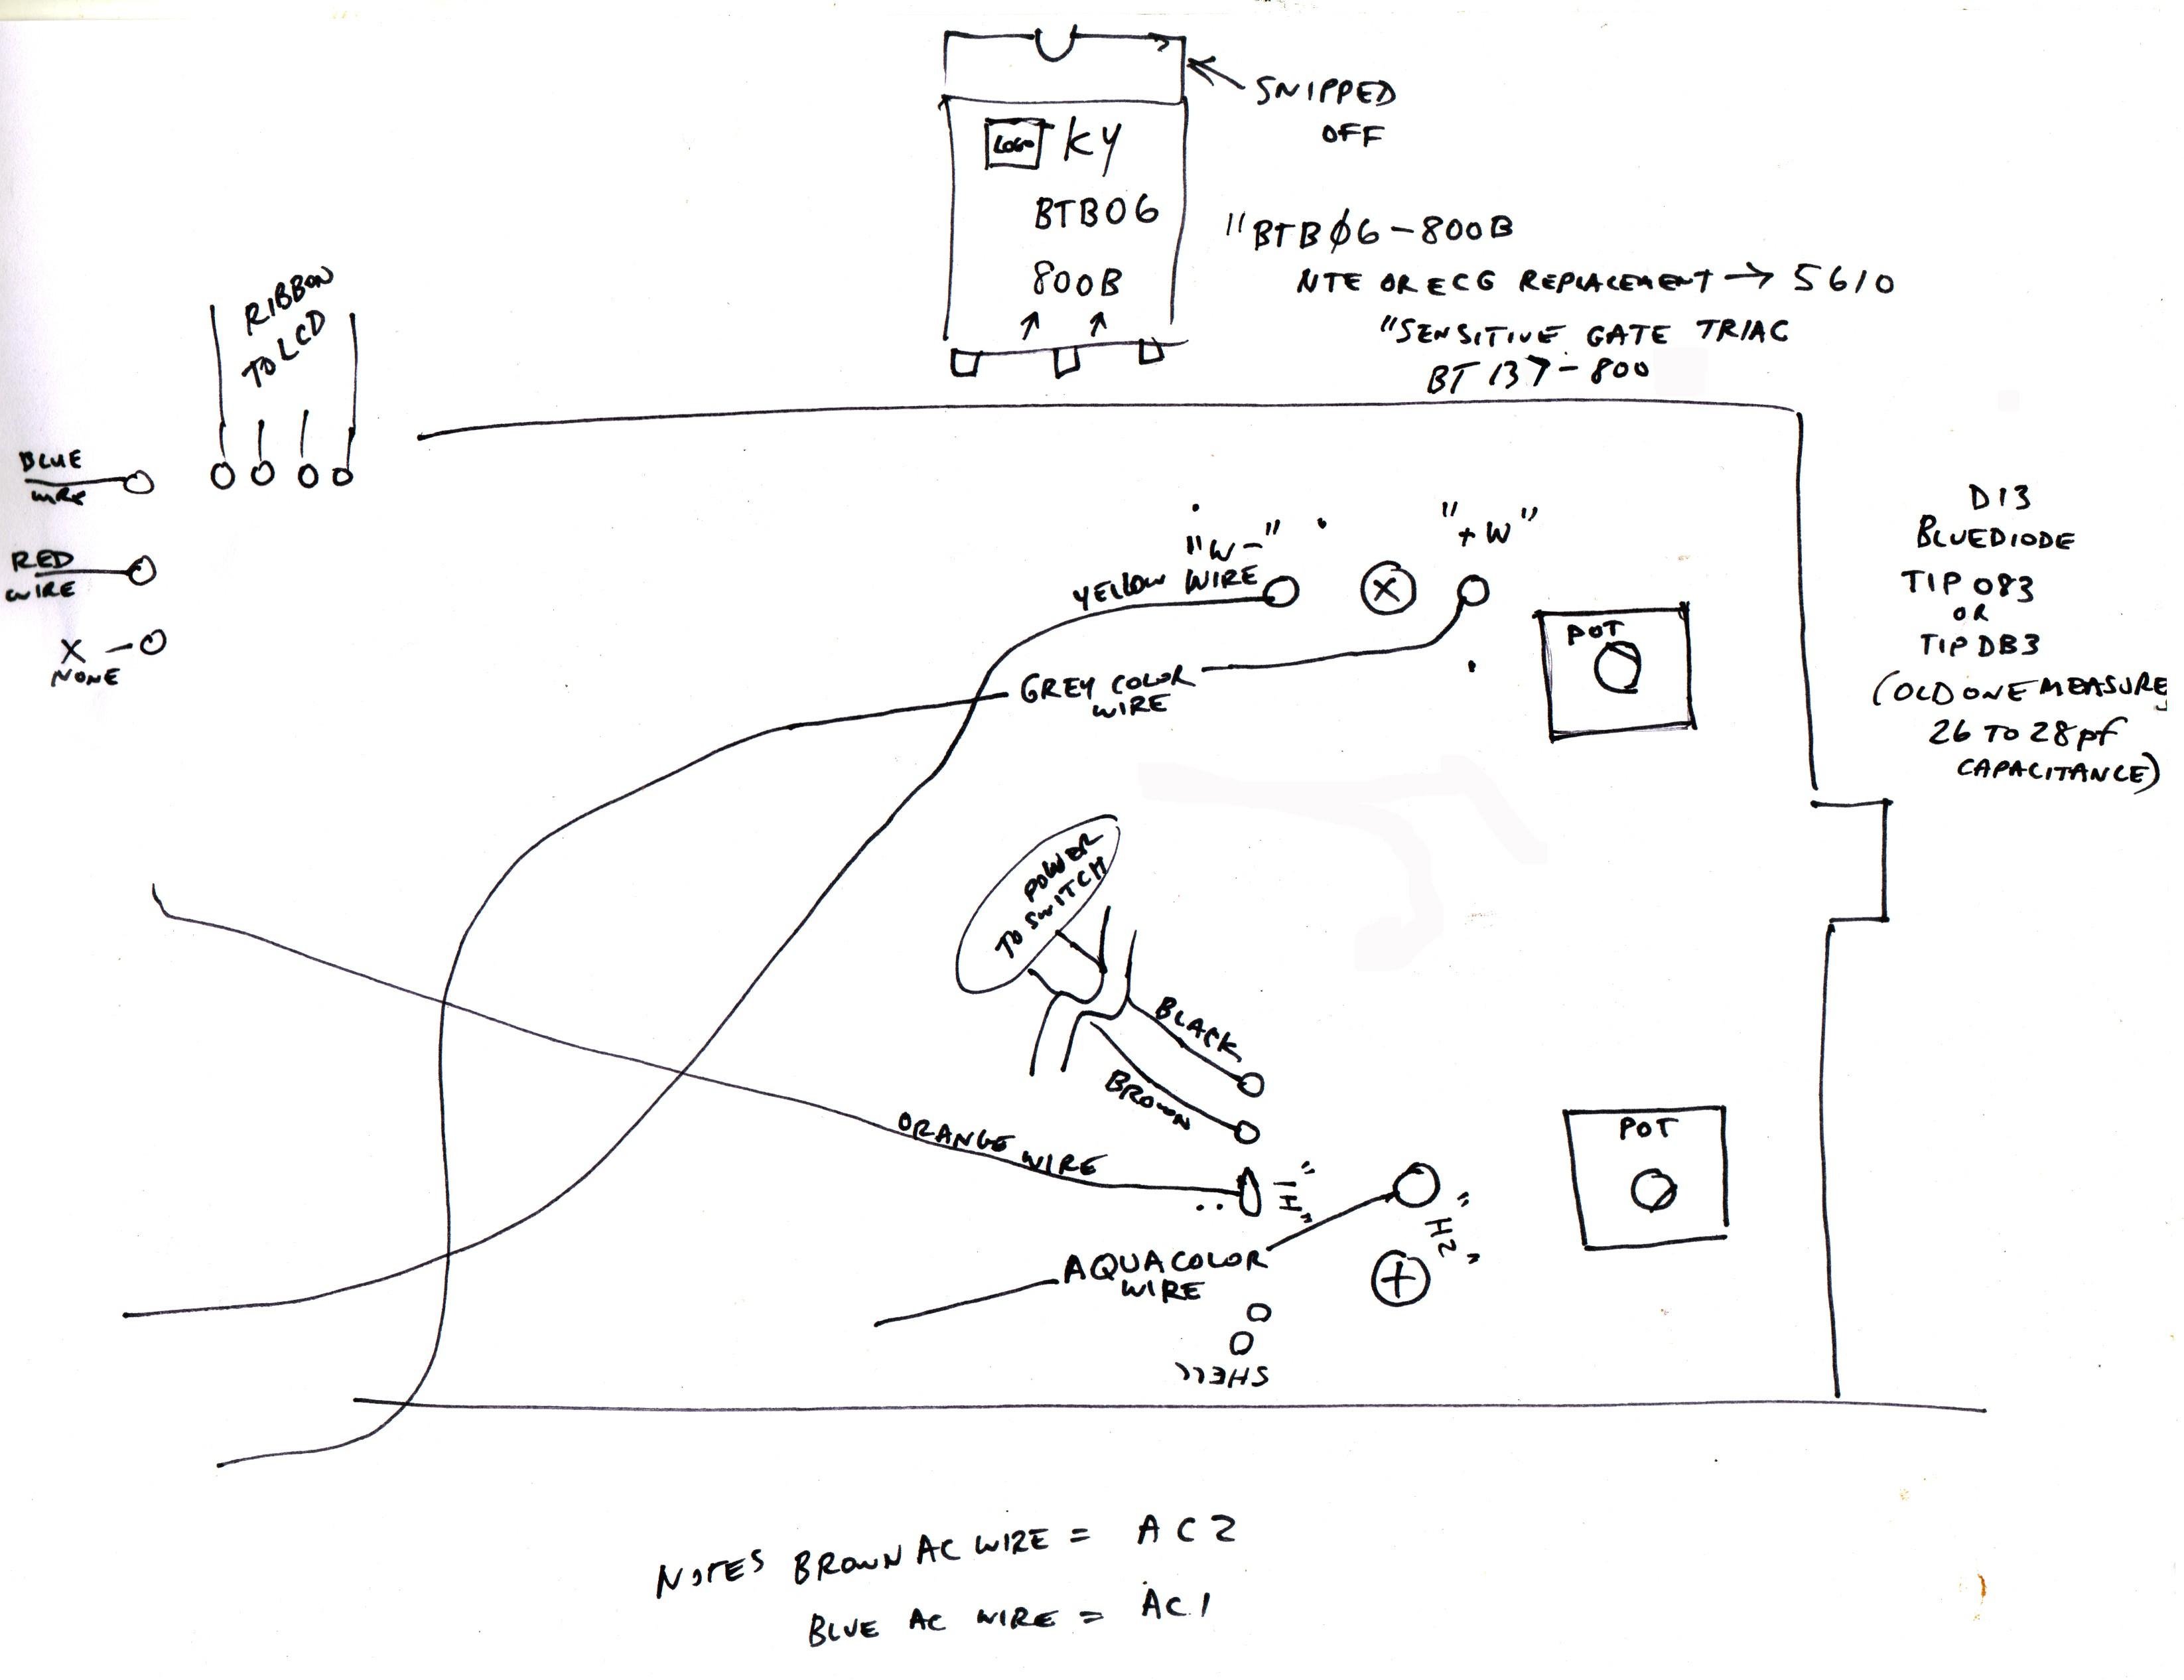 Pen Circuit Diagram Data 555 Timer Pdf Http Wwwnextgr Othercircuits 555lm555ne555timer Free Photo On Paper Performance Download Rh Jooinn Com Camera